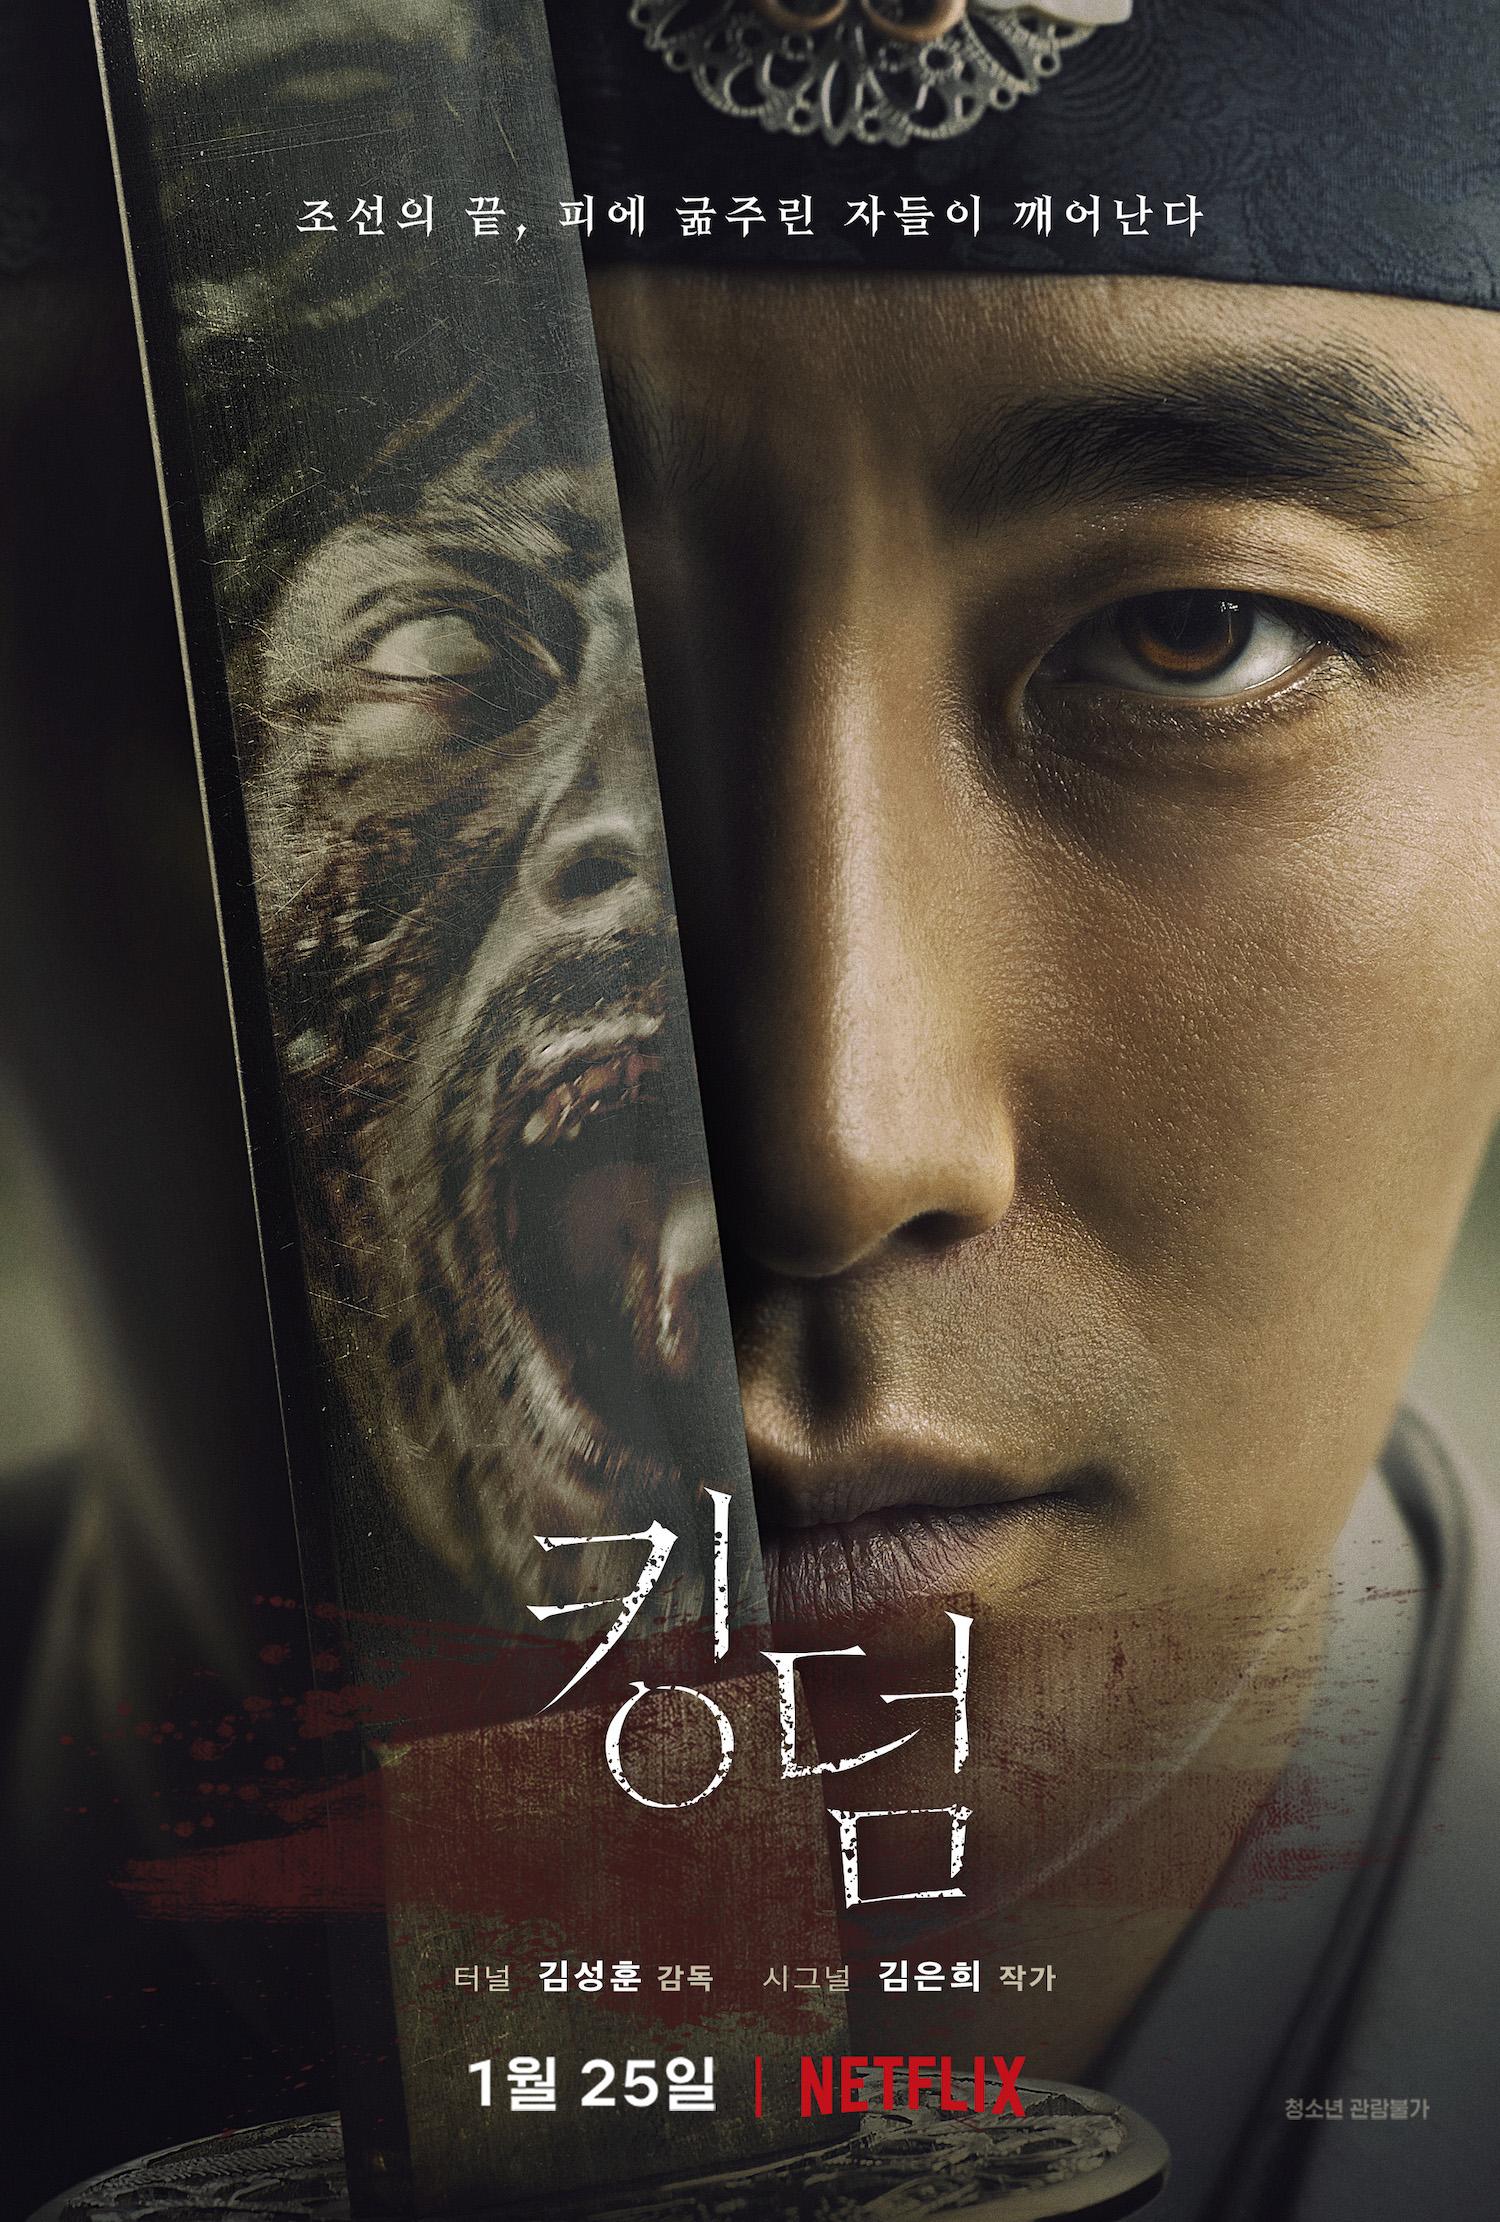 Download Drama Korea Kingdom : download, drama, korea, kingdom, Kingdom, (Korean, Drama), AsianWiki